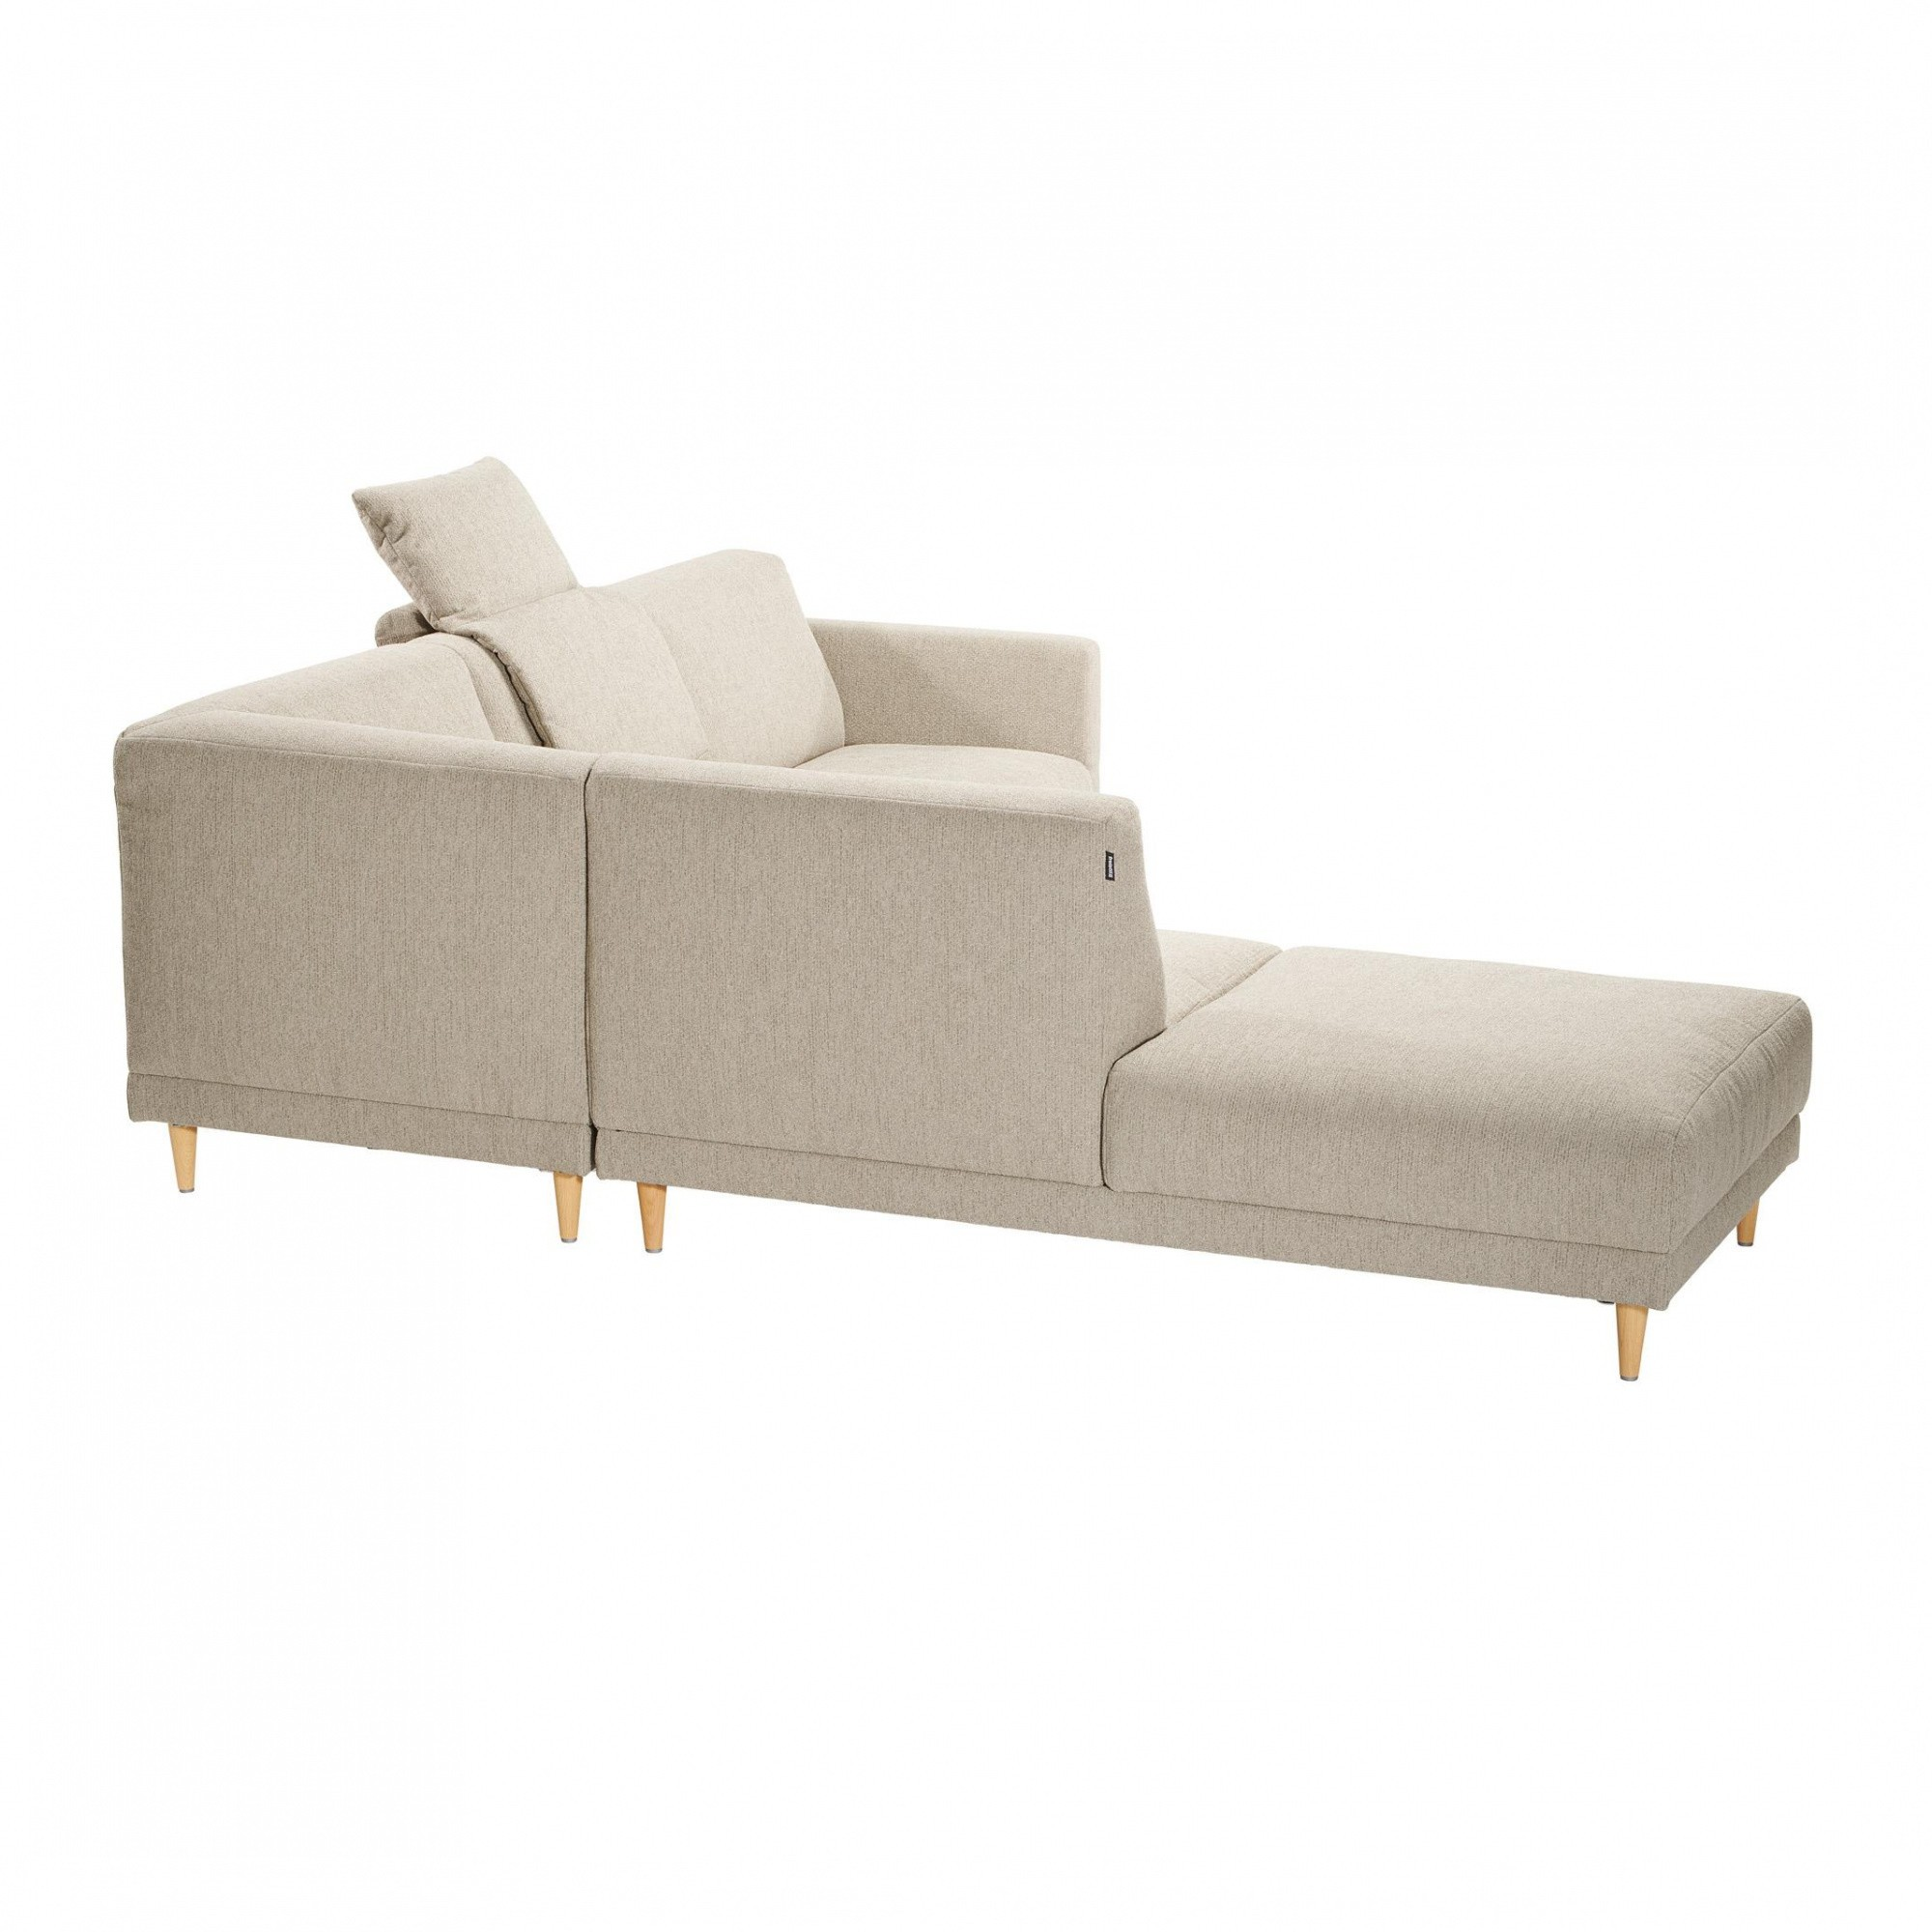 Freistil Rolf Benz Freistil 141 Lounge Sofa 225x258cm Ambientedirect